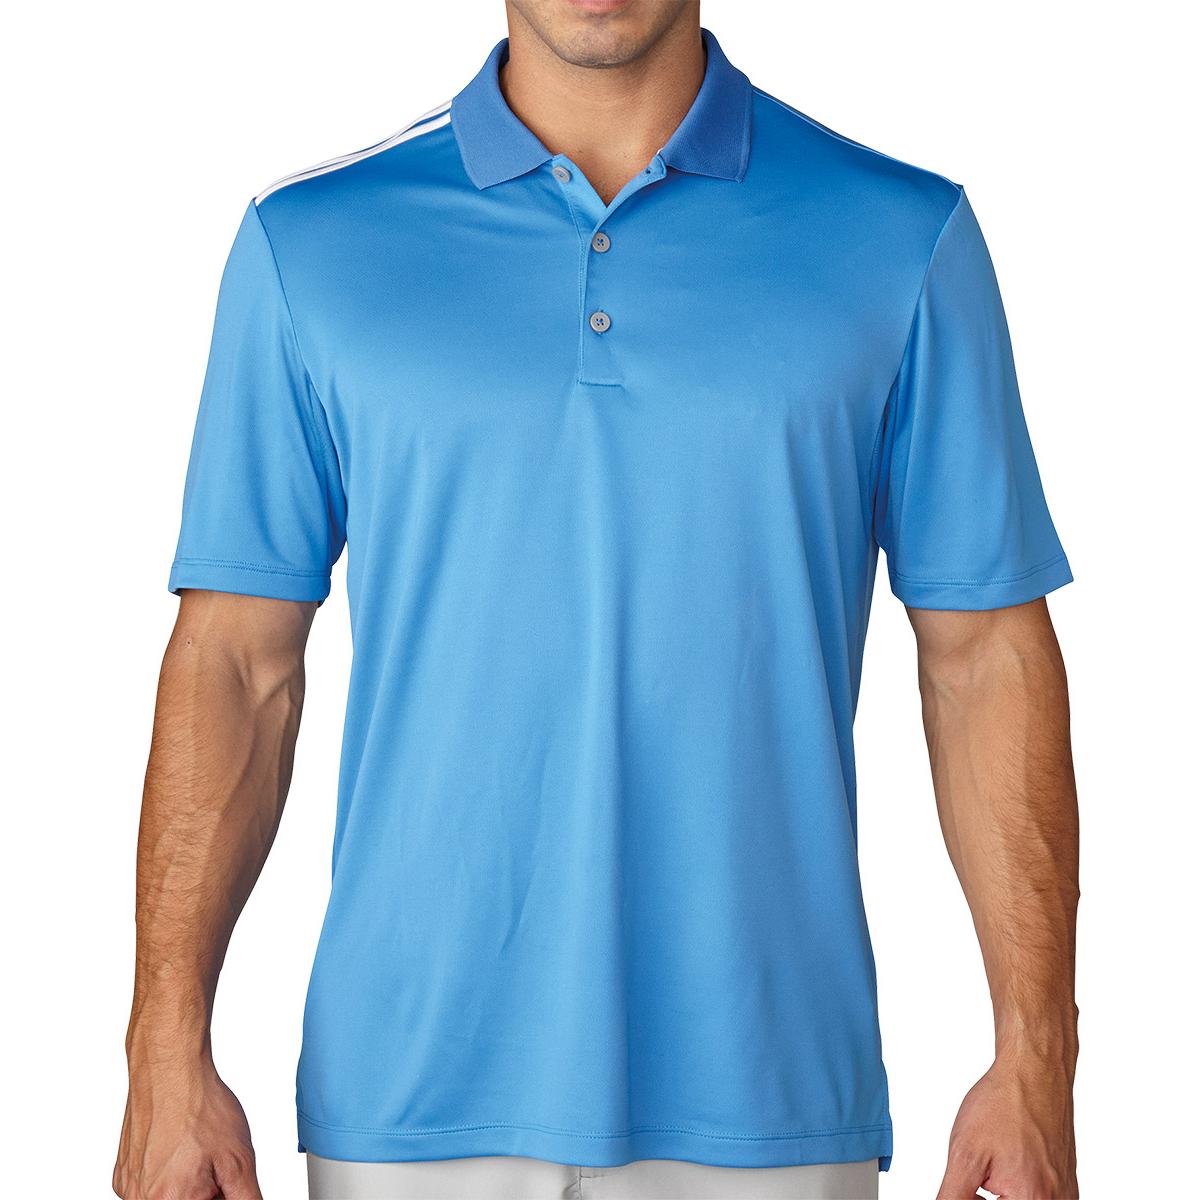 d1d87d33 Adidas Golf Mens Climacool Puremotion 3 Stripe Polo Shirt   Top Mode ...